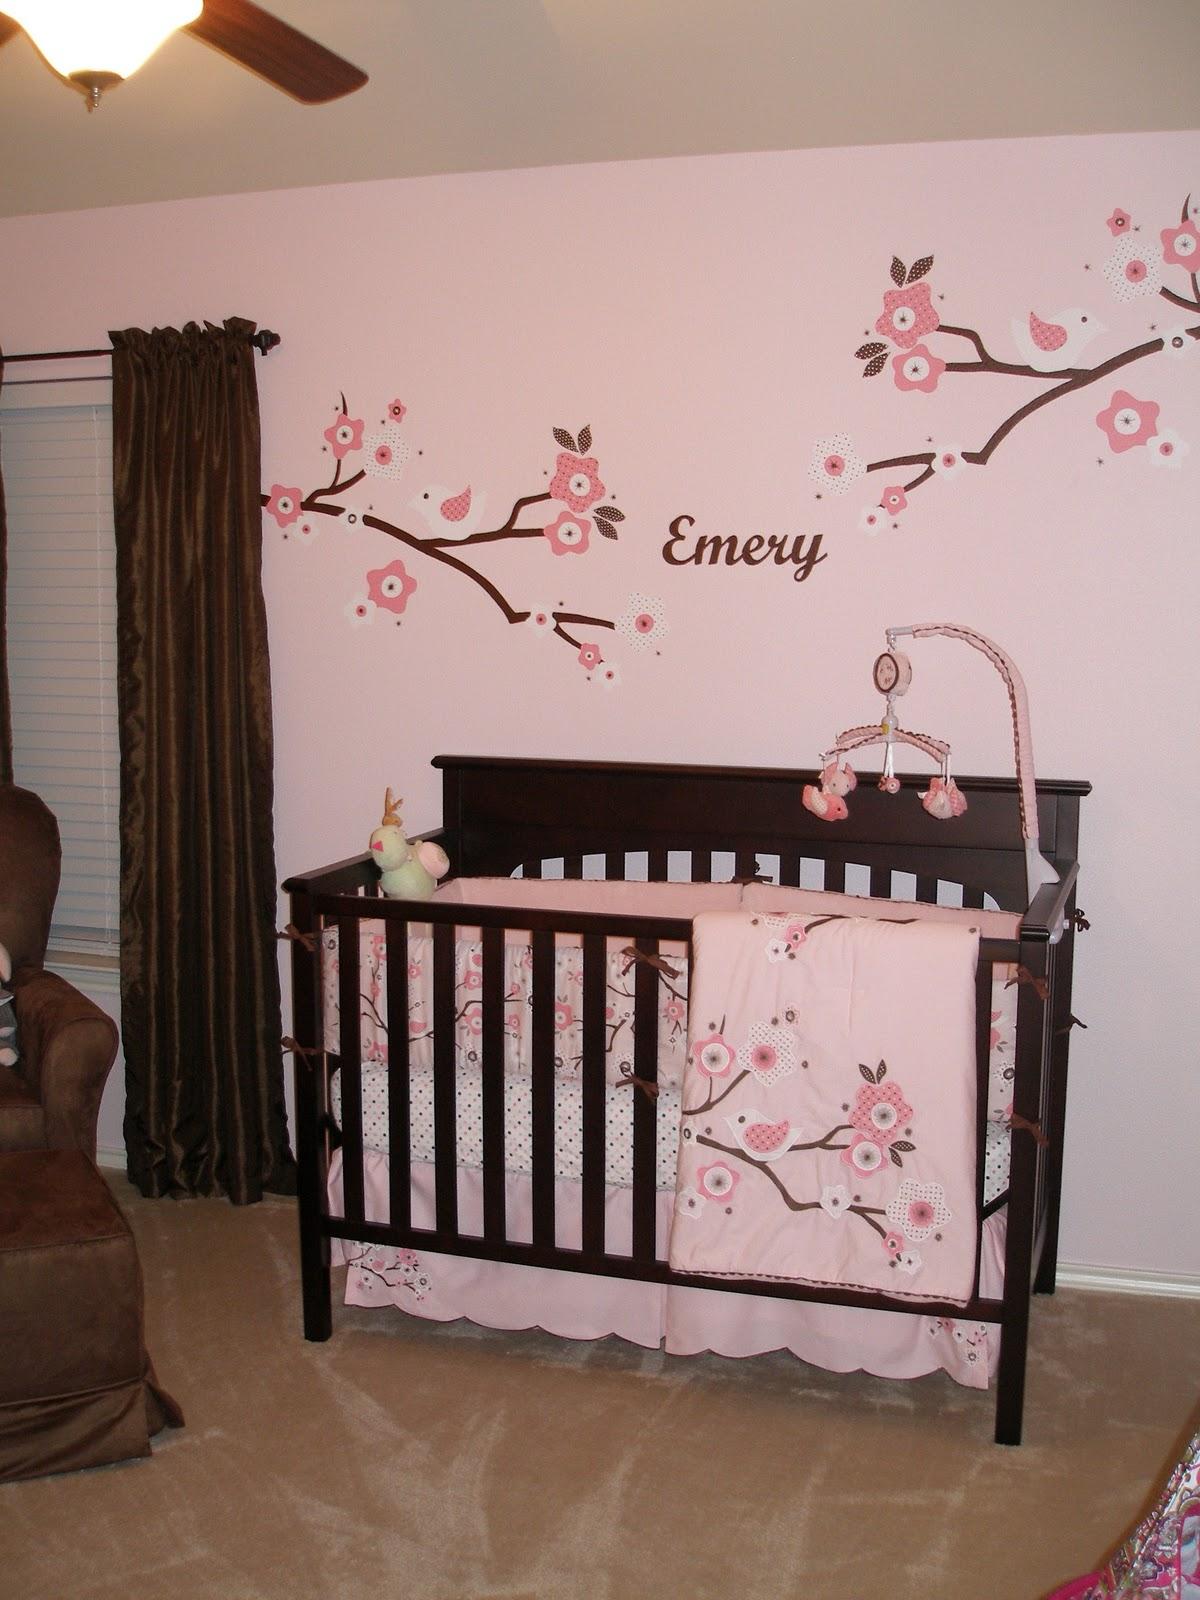 Emery S Nursery